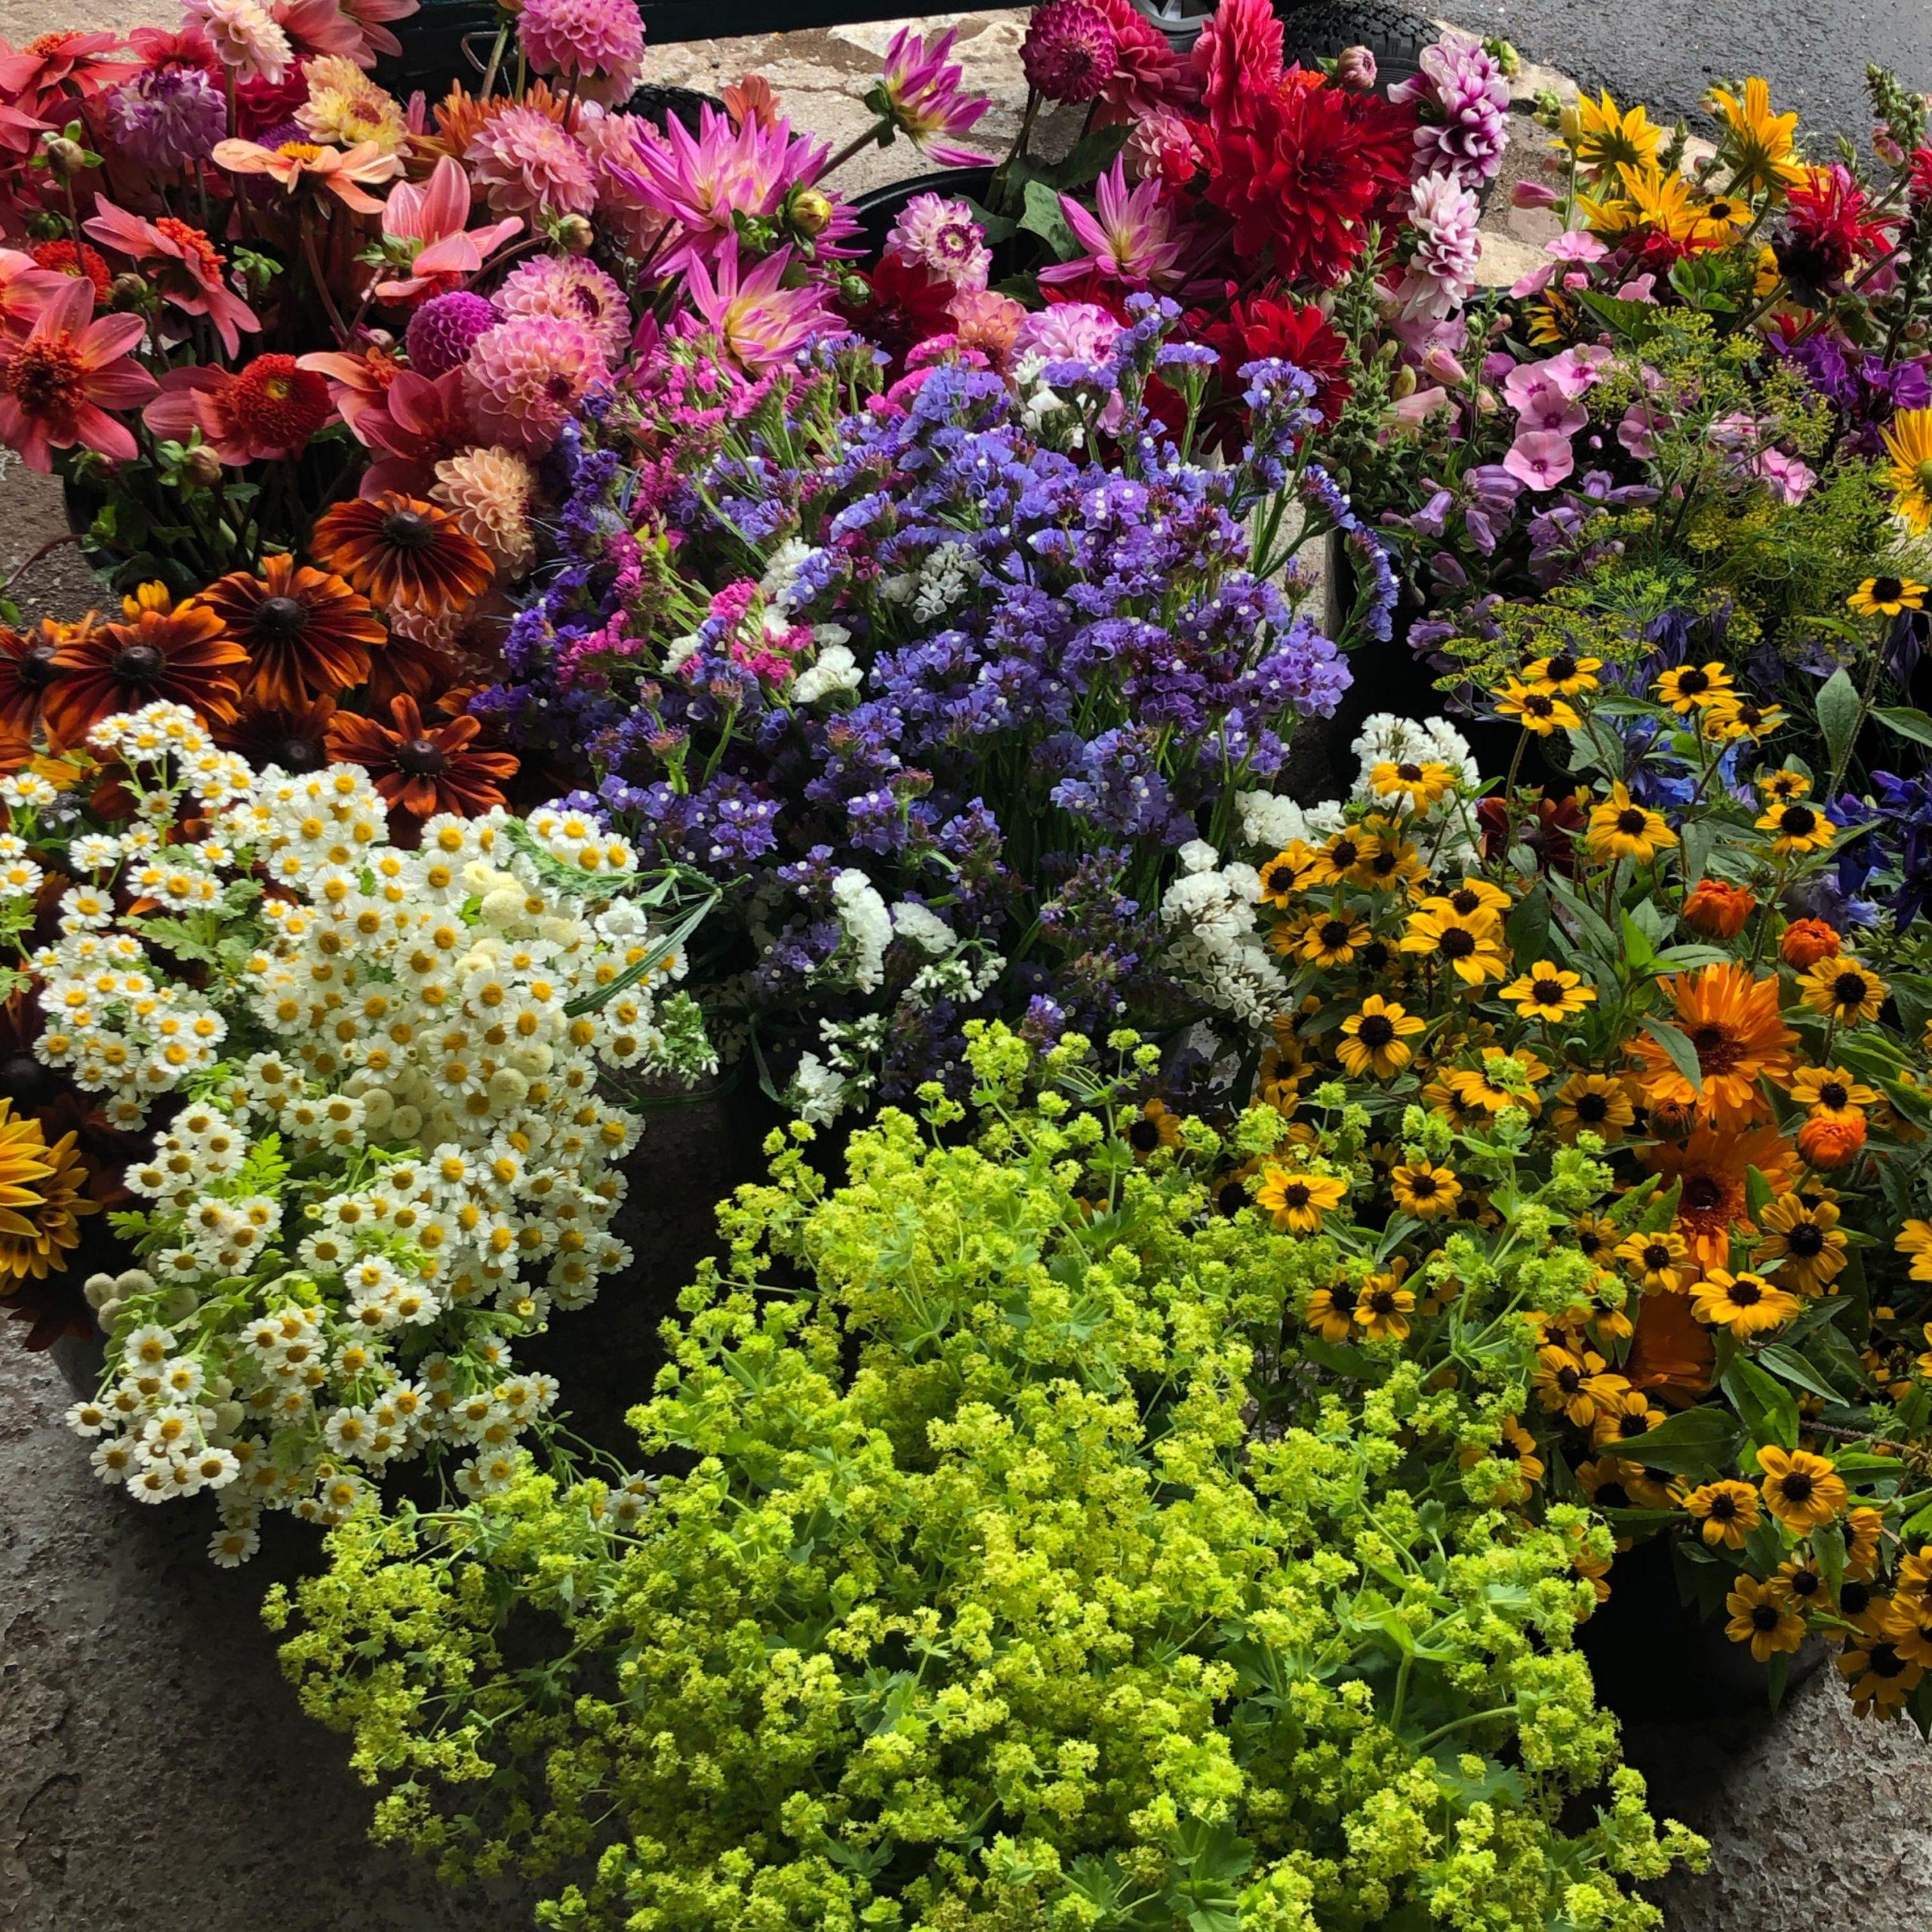 Keeds Farm Flowers